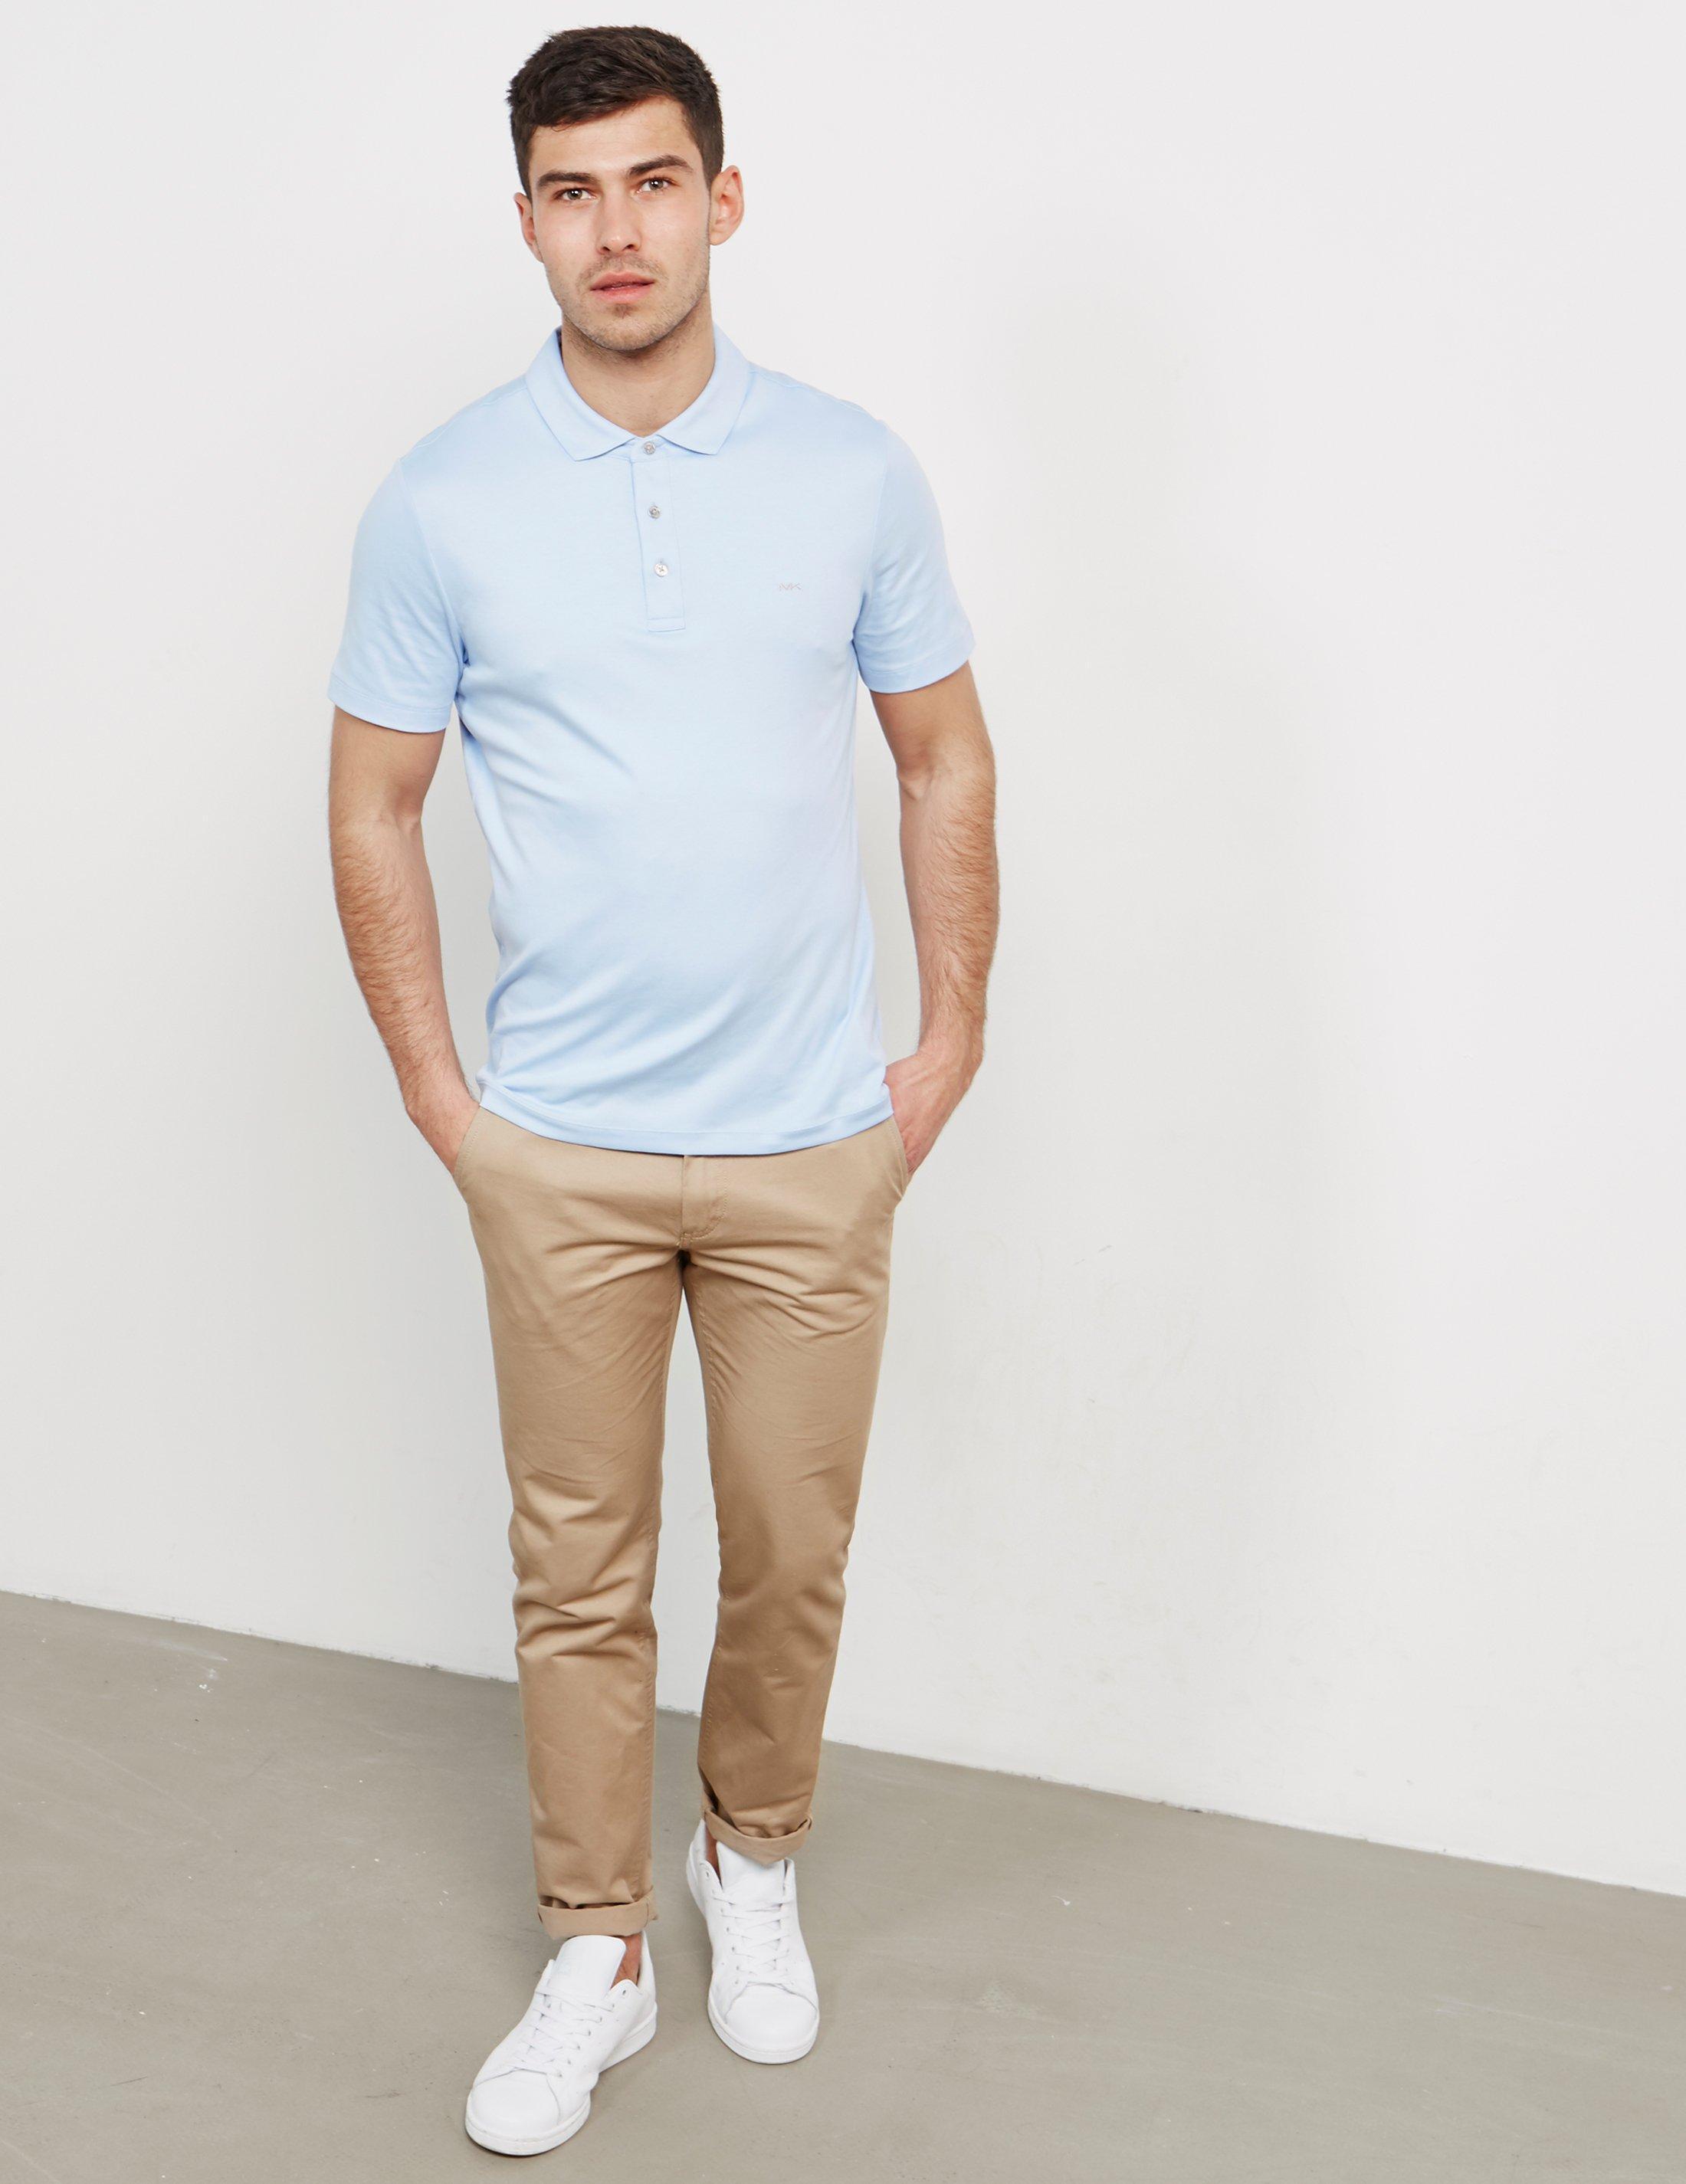 7ed7db0a Lyst - Michael Kors Sleek Short Sleeve Polo Shirt Blue in Blue for ...